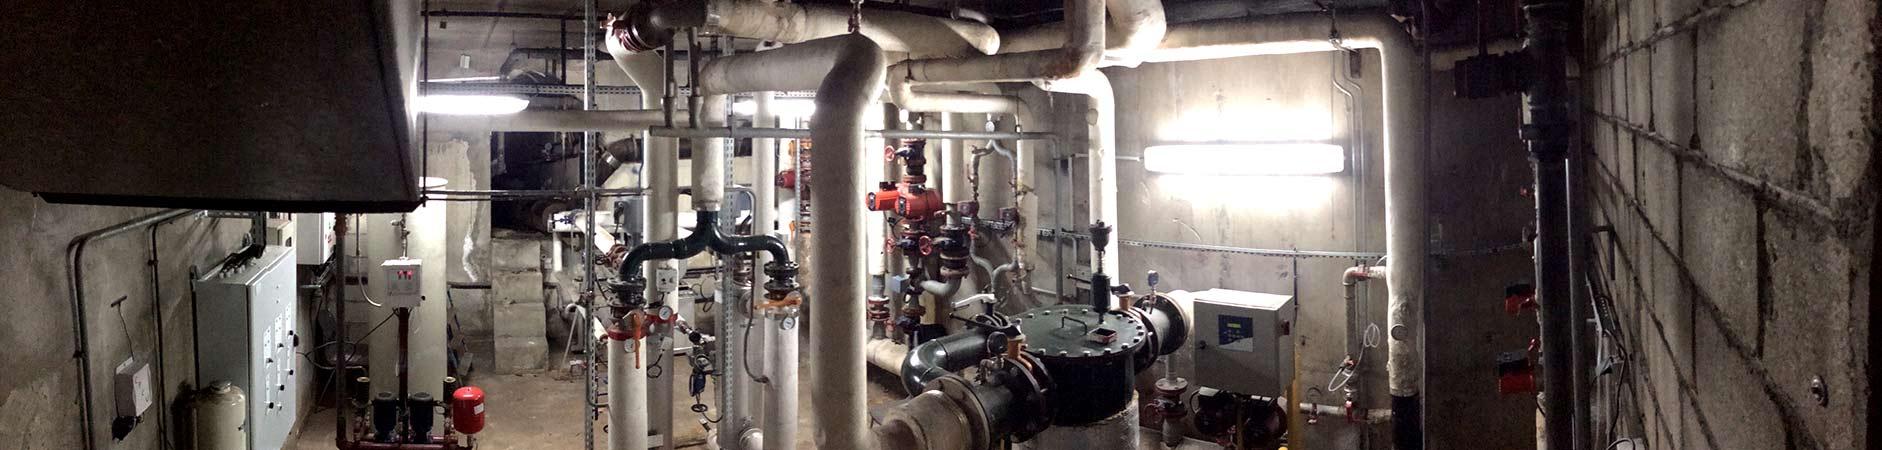 PVCF Maintenance